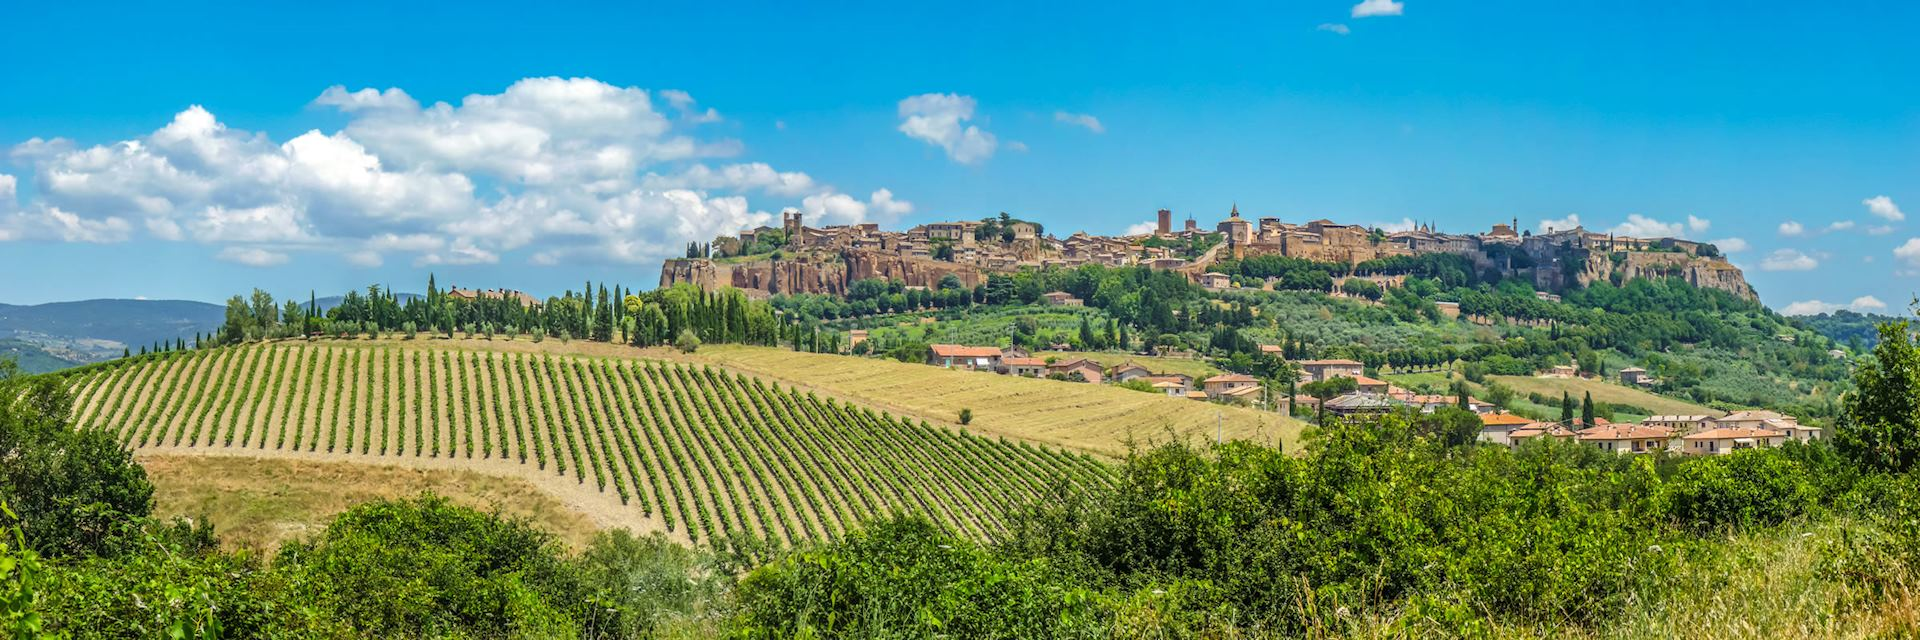 Orvieto scenery